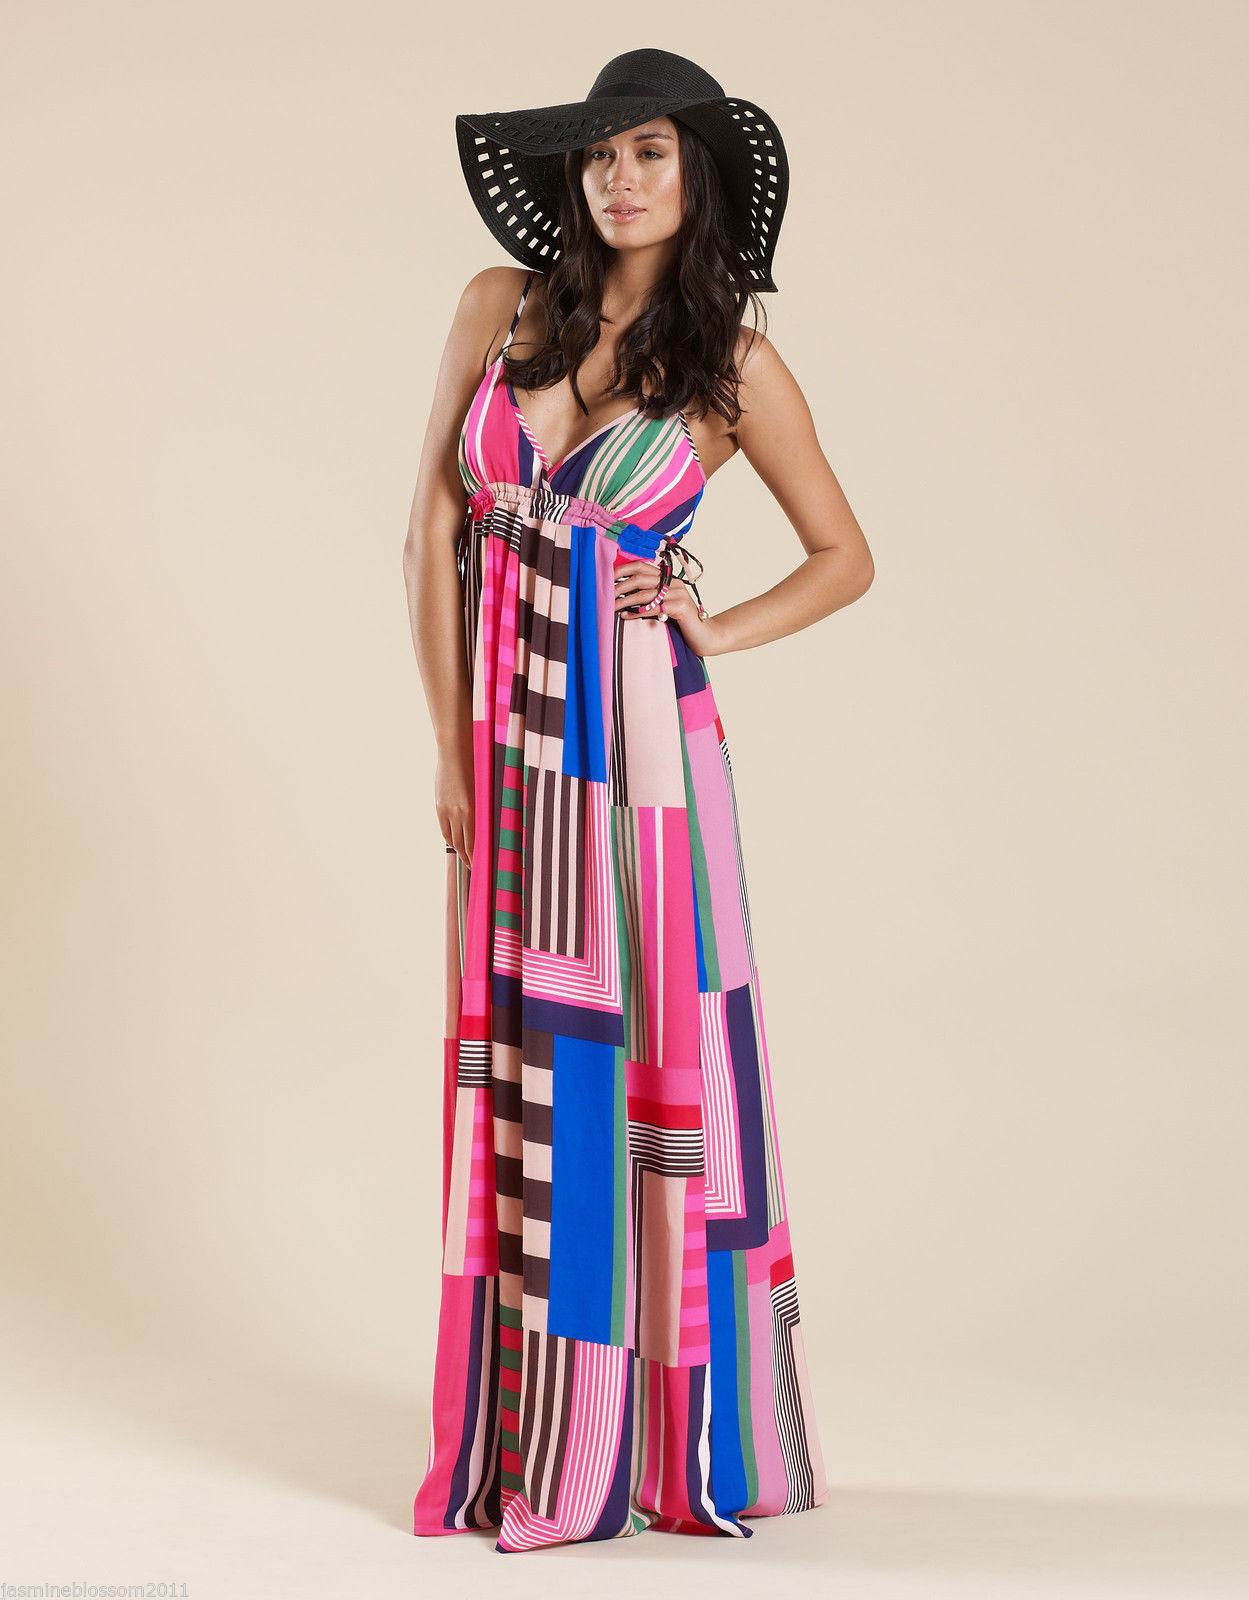 Accessorize Monsoon Stripe Retro Print Evening Occasion Summer Maxi Dress Small